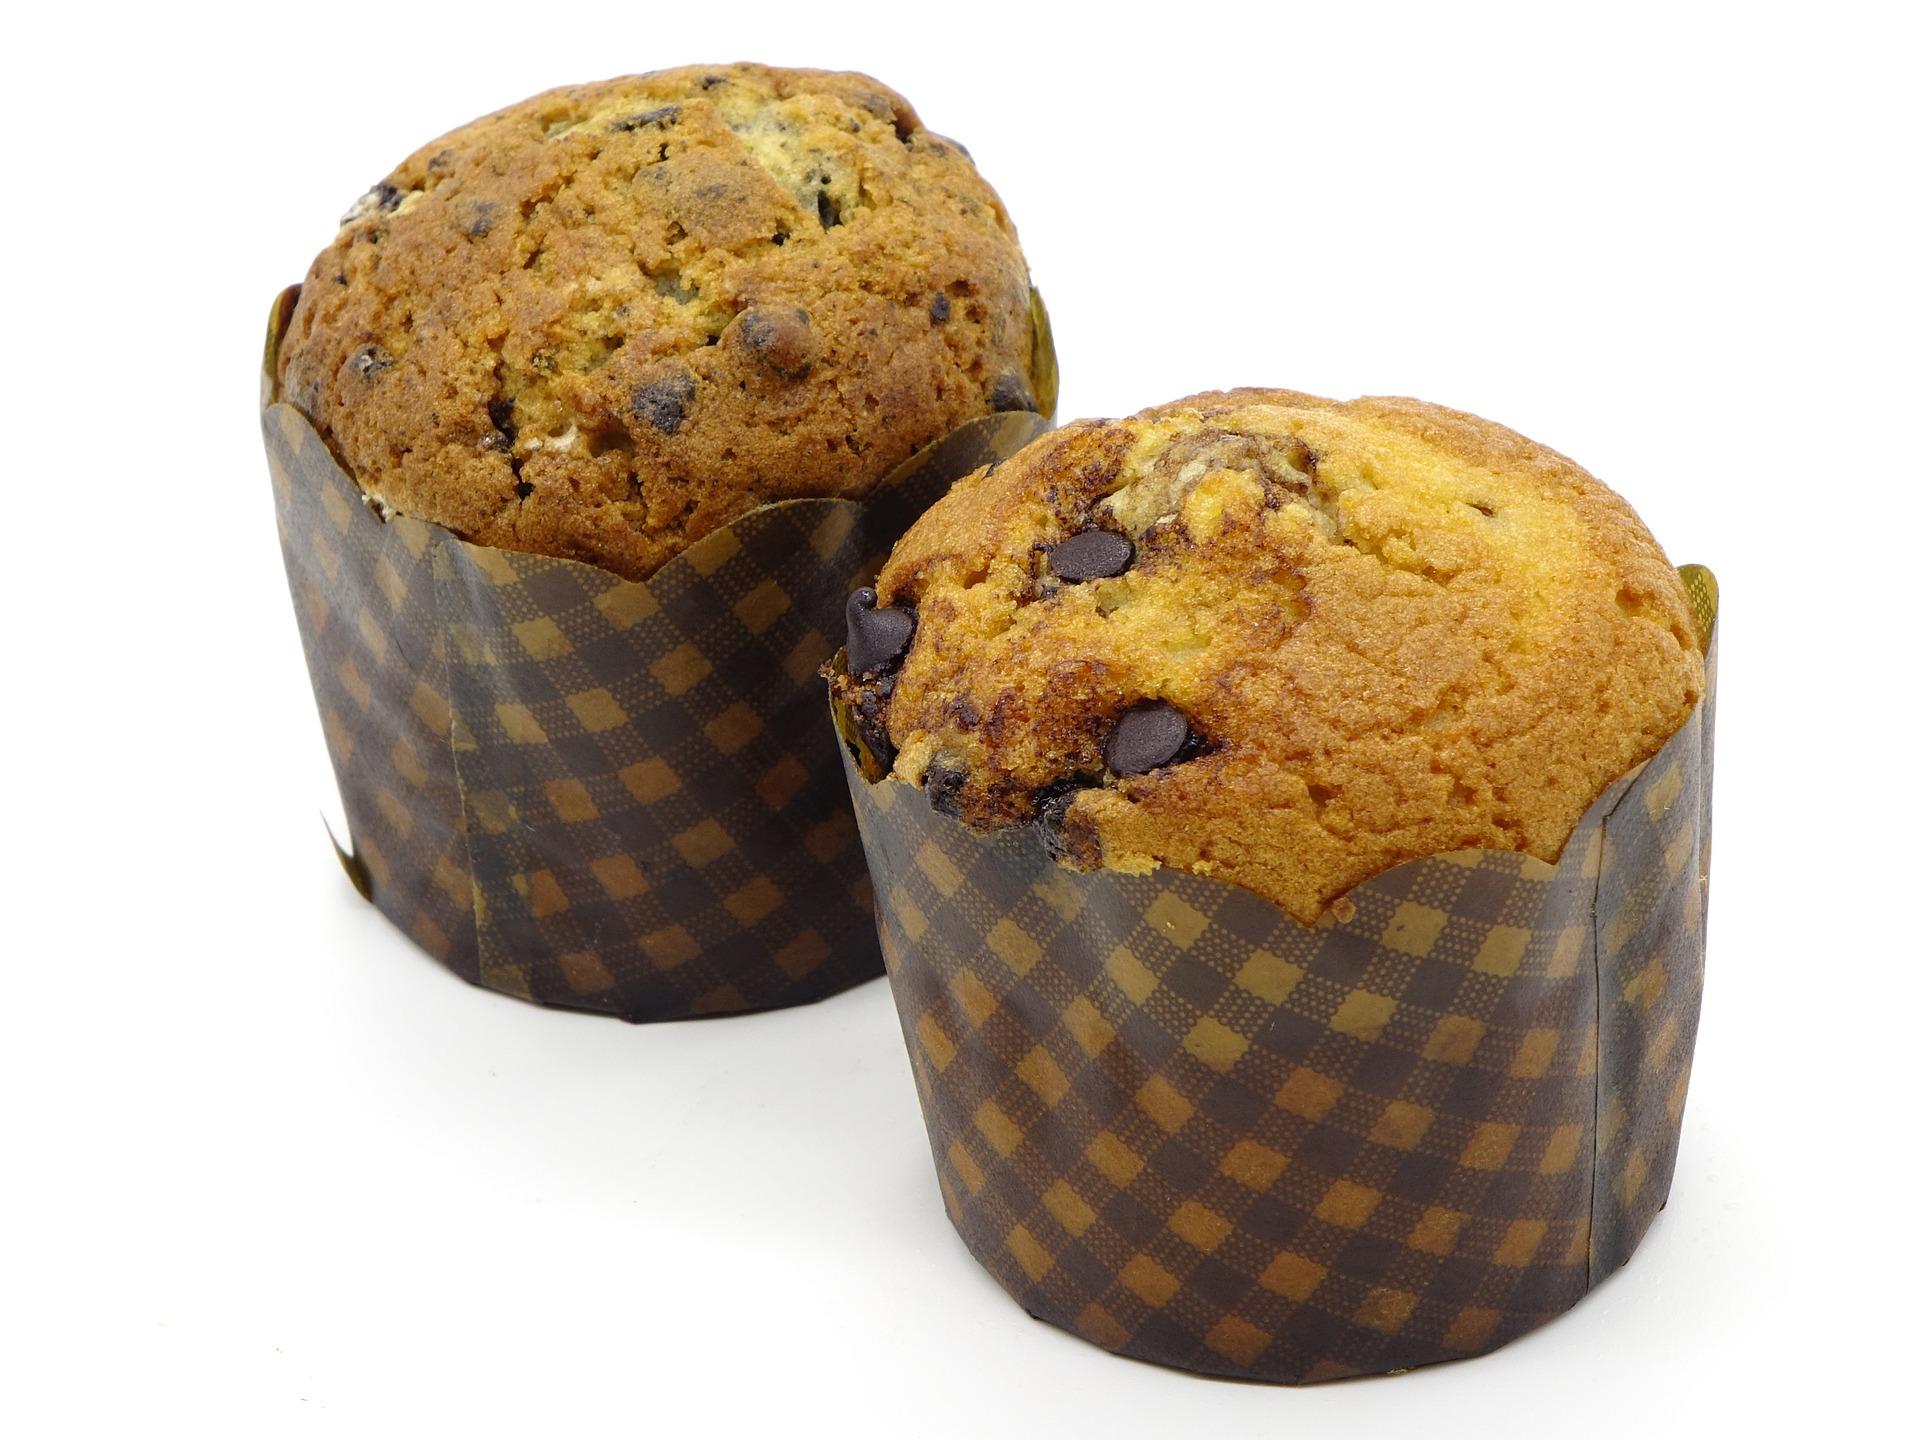 Baked Muffins, Food, Dessert, Fresh, Muffin, HQ Photo